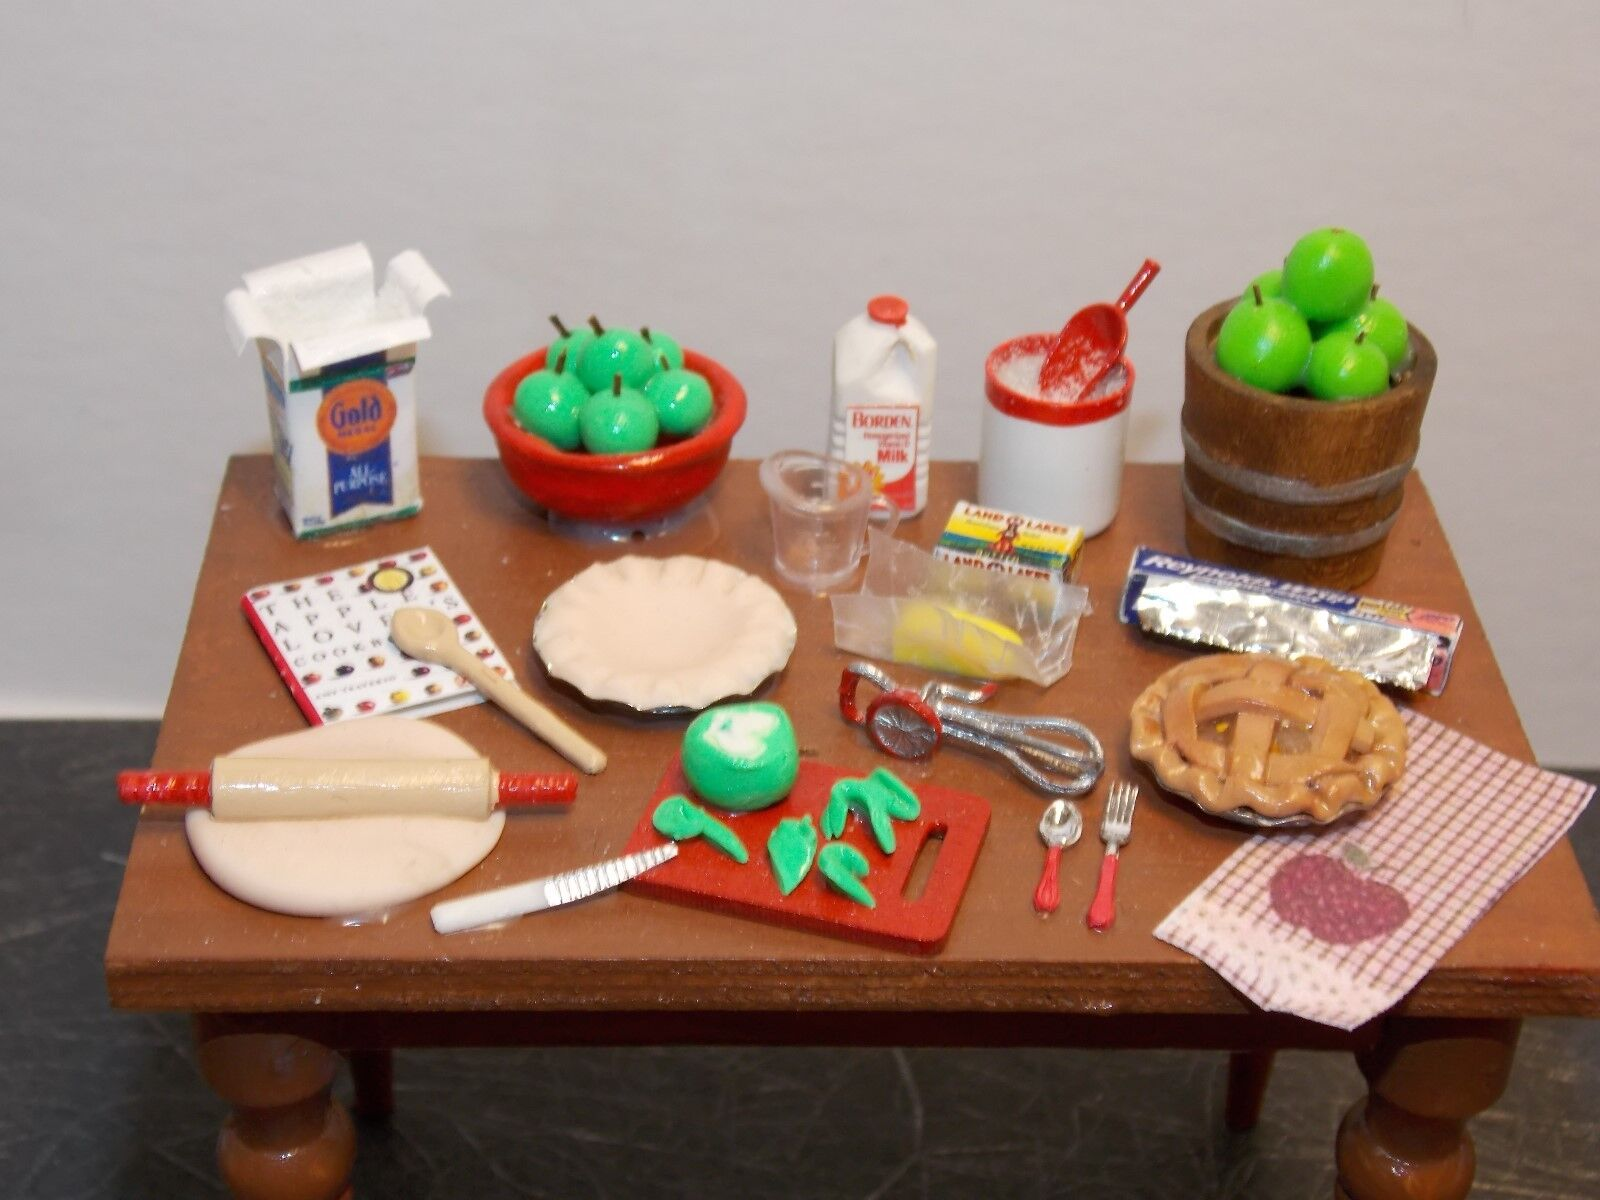 Casa de muñecas en miniatura cocina para hornear Apple tortas mesa de trabajo 1 12 G84 dollys Galería